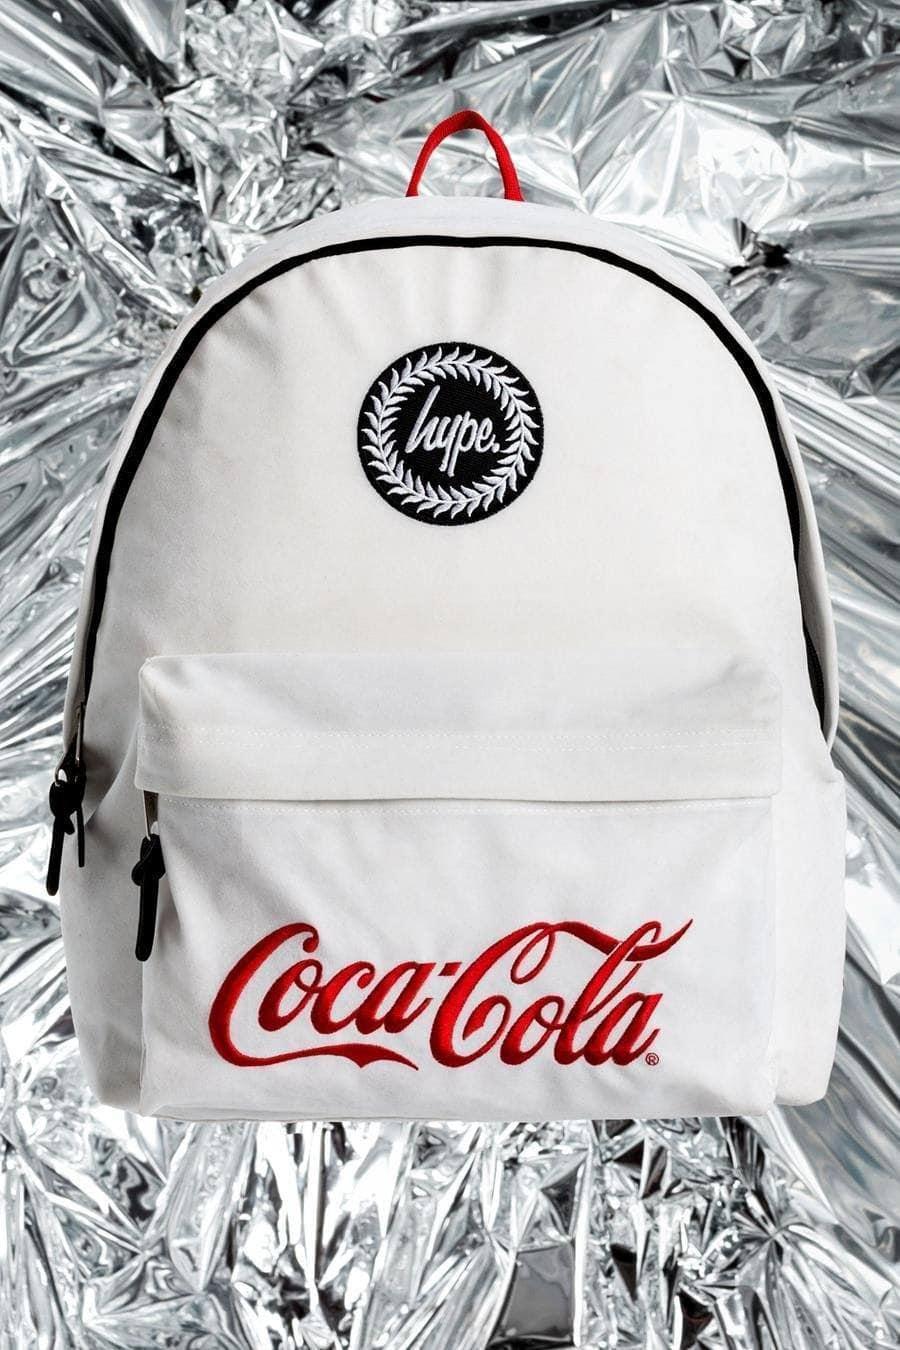 HYPE X Coca-Cola Grey Coca-Cola Cooler Backpack